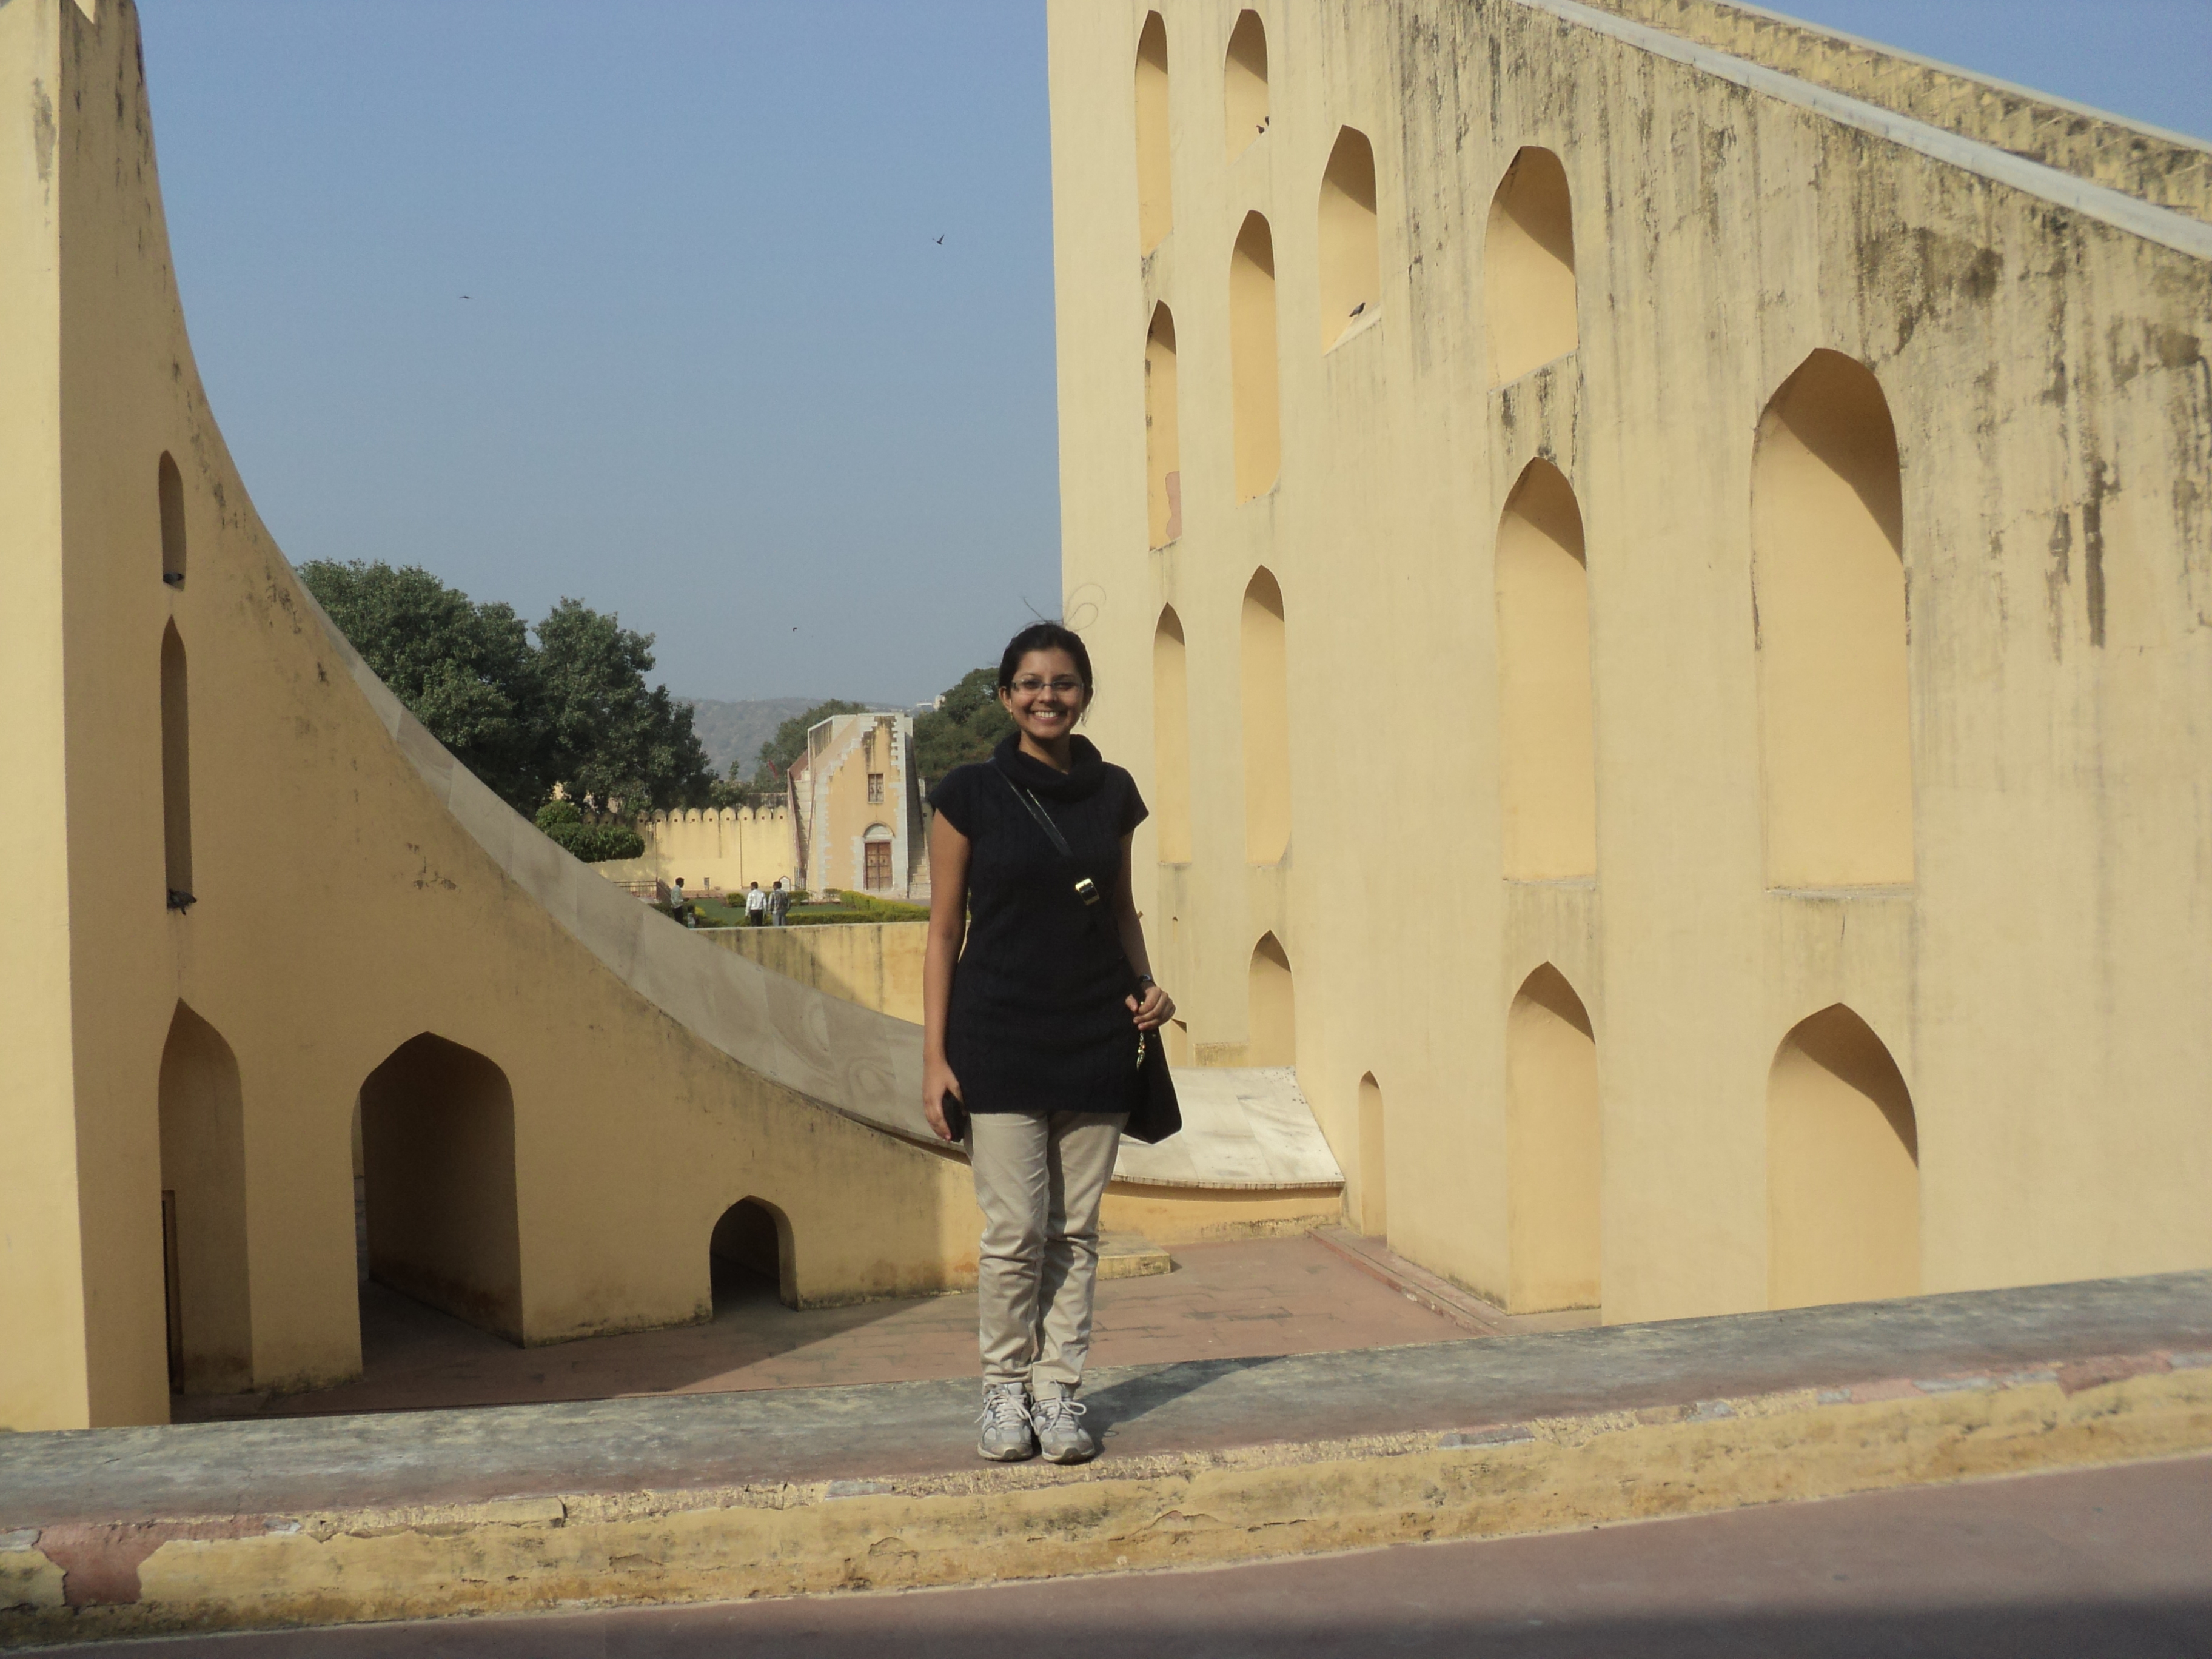 The giant timekeeper in Jaipur The Jantar Mantar, Jaipur - India Oindrila De